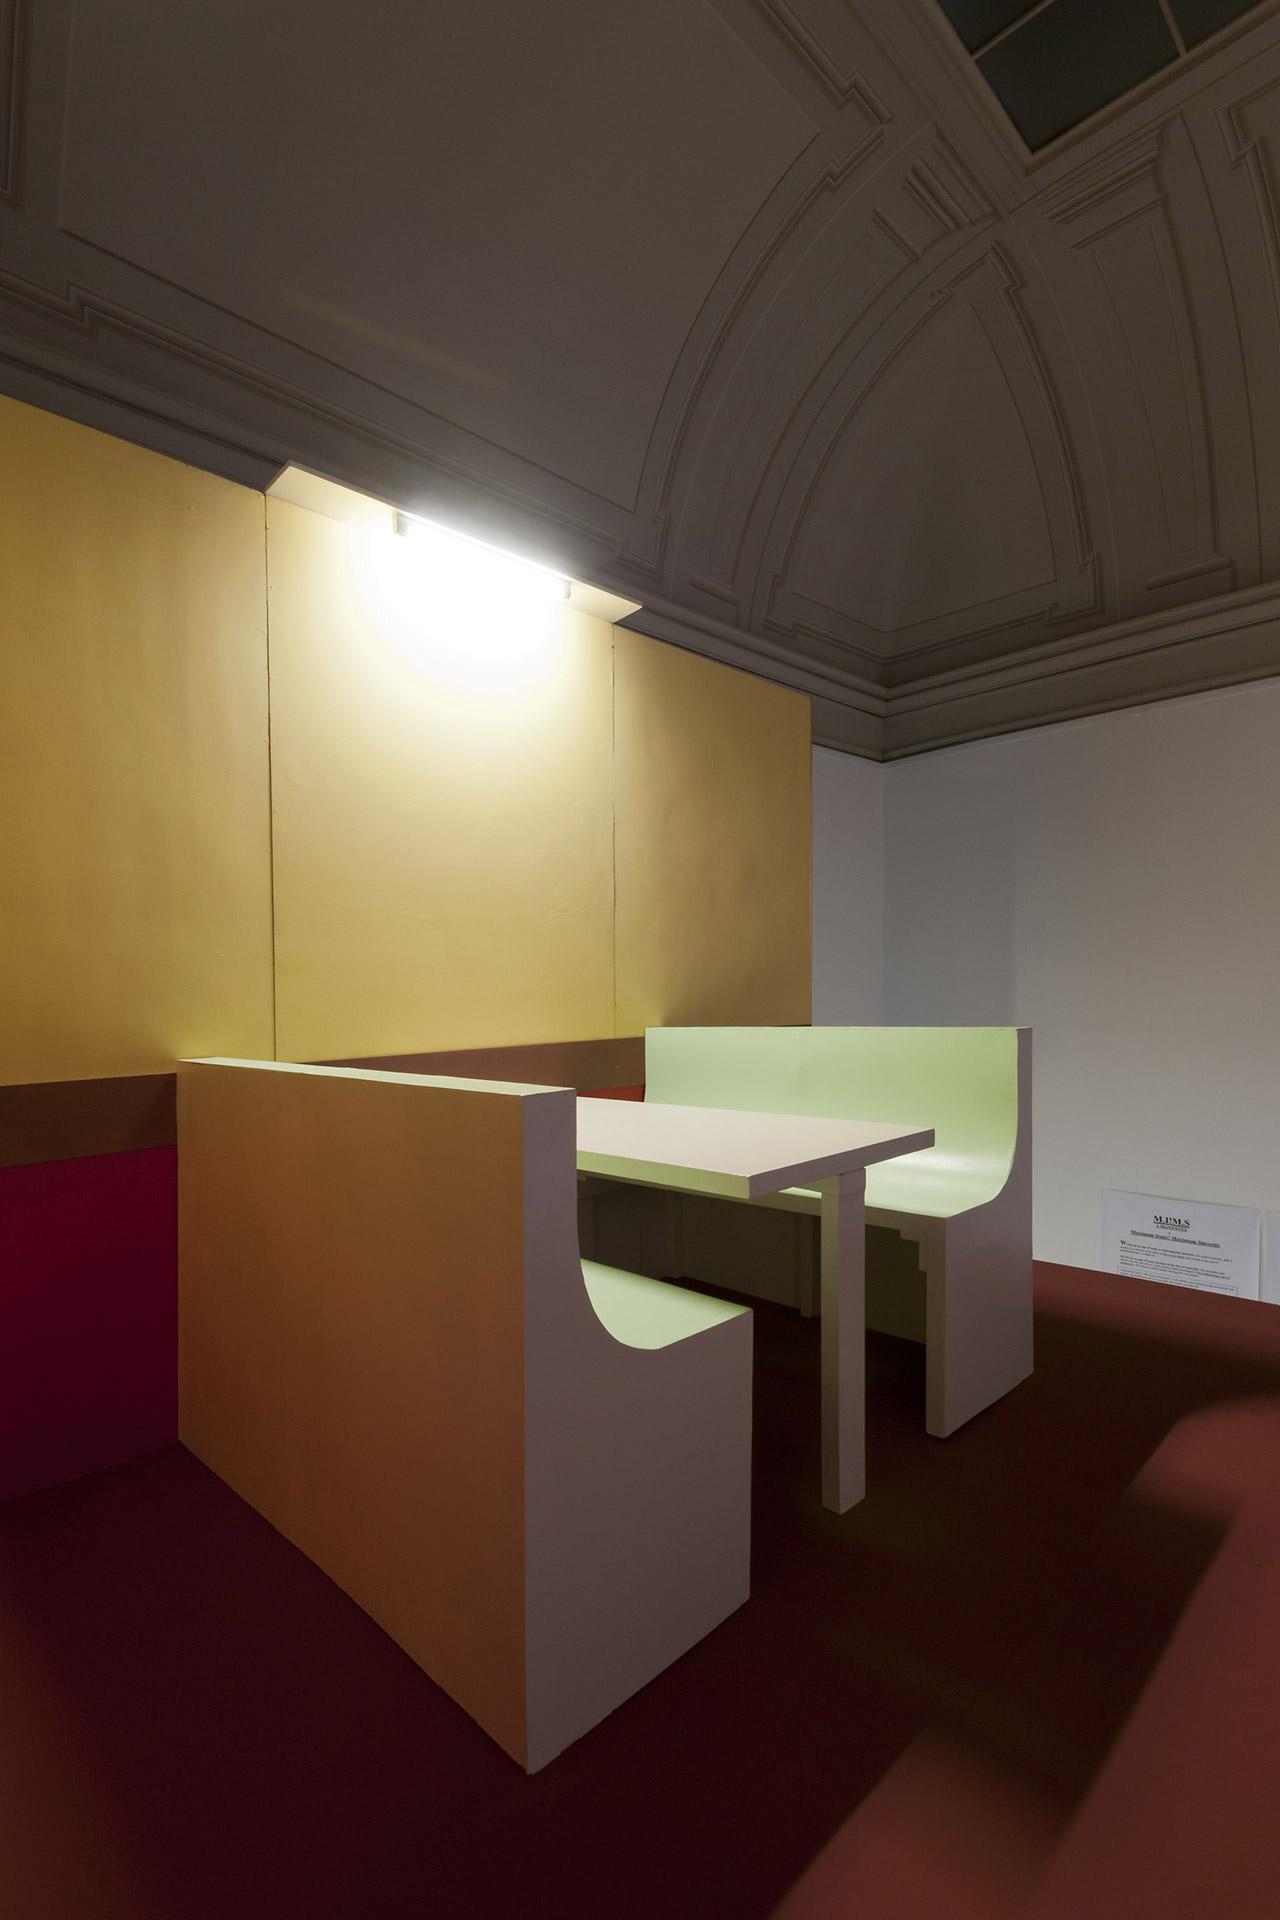 Andy-Holden-Kunsthalle-Winterthur-2015-1.jpg